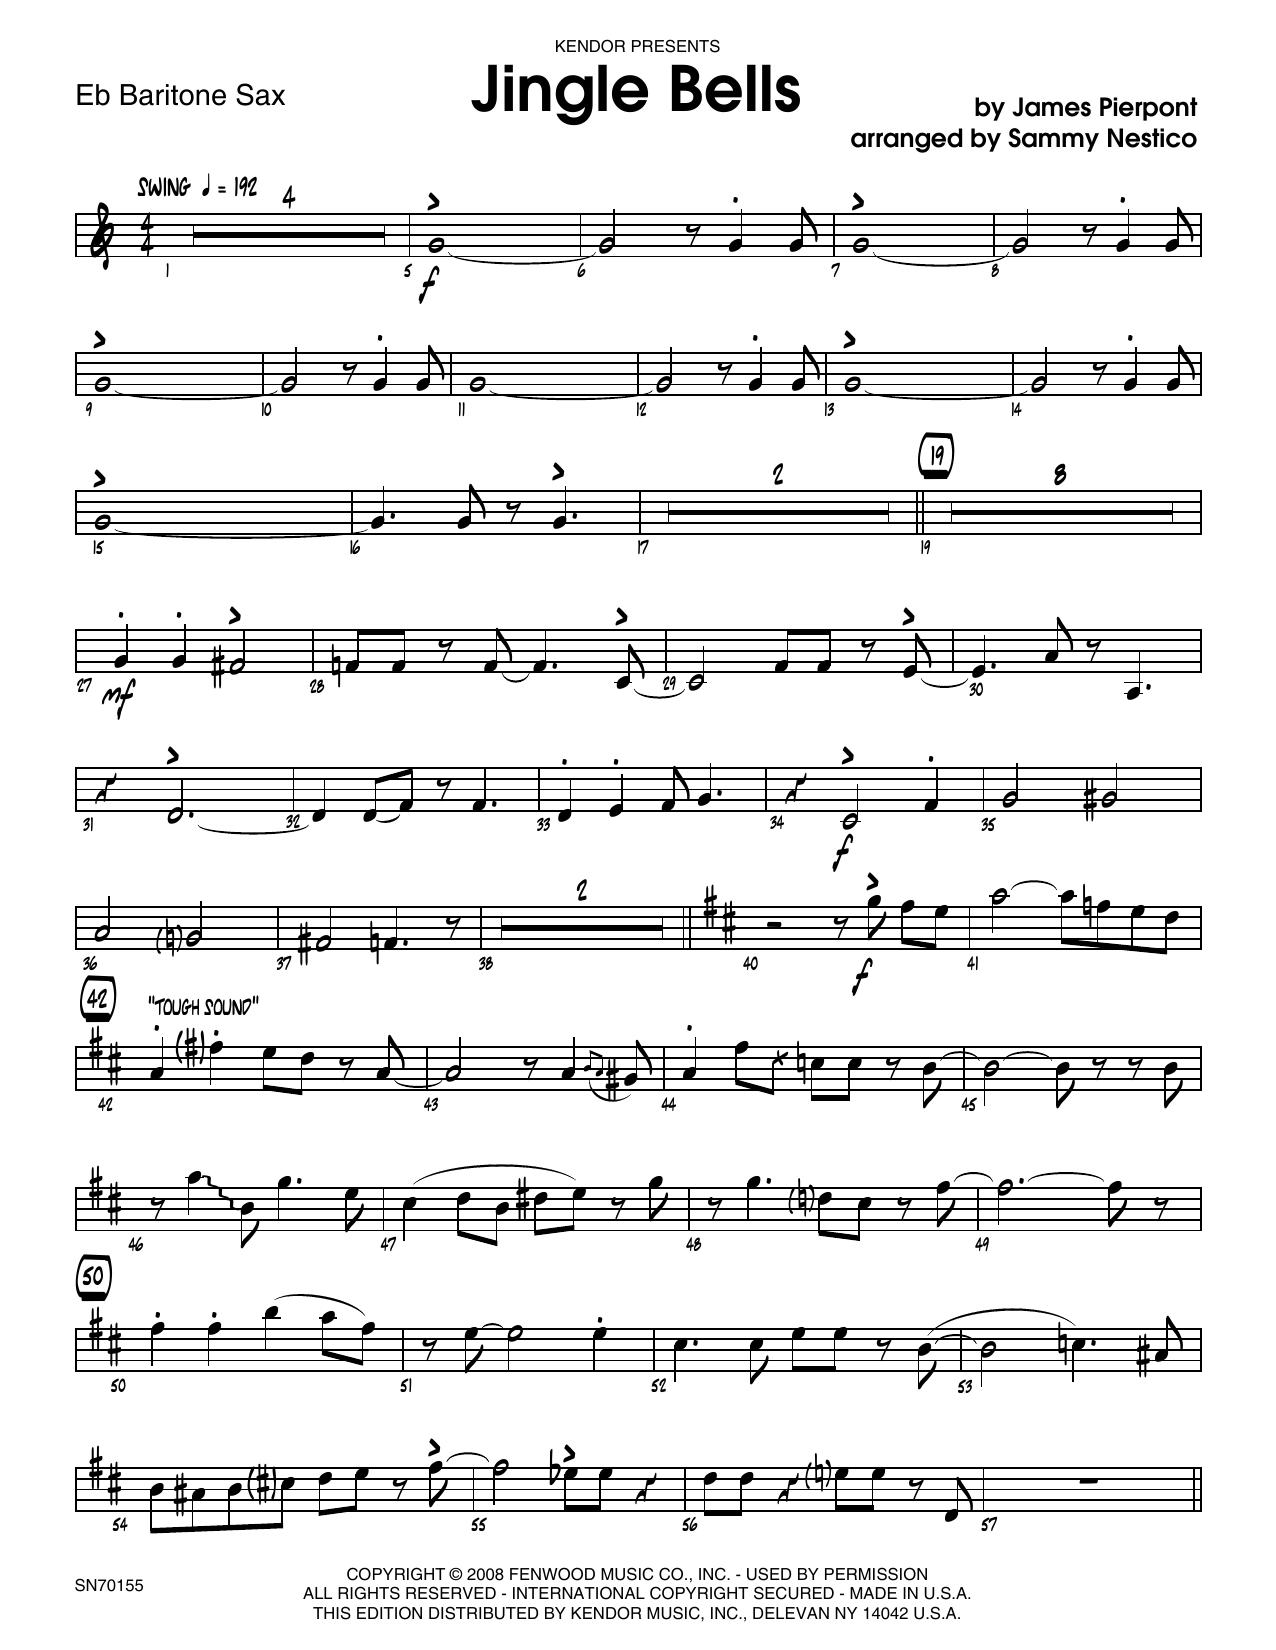 Jingle Bells - Eb Baritone Saxophone Sheet Music